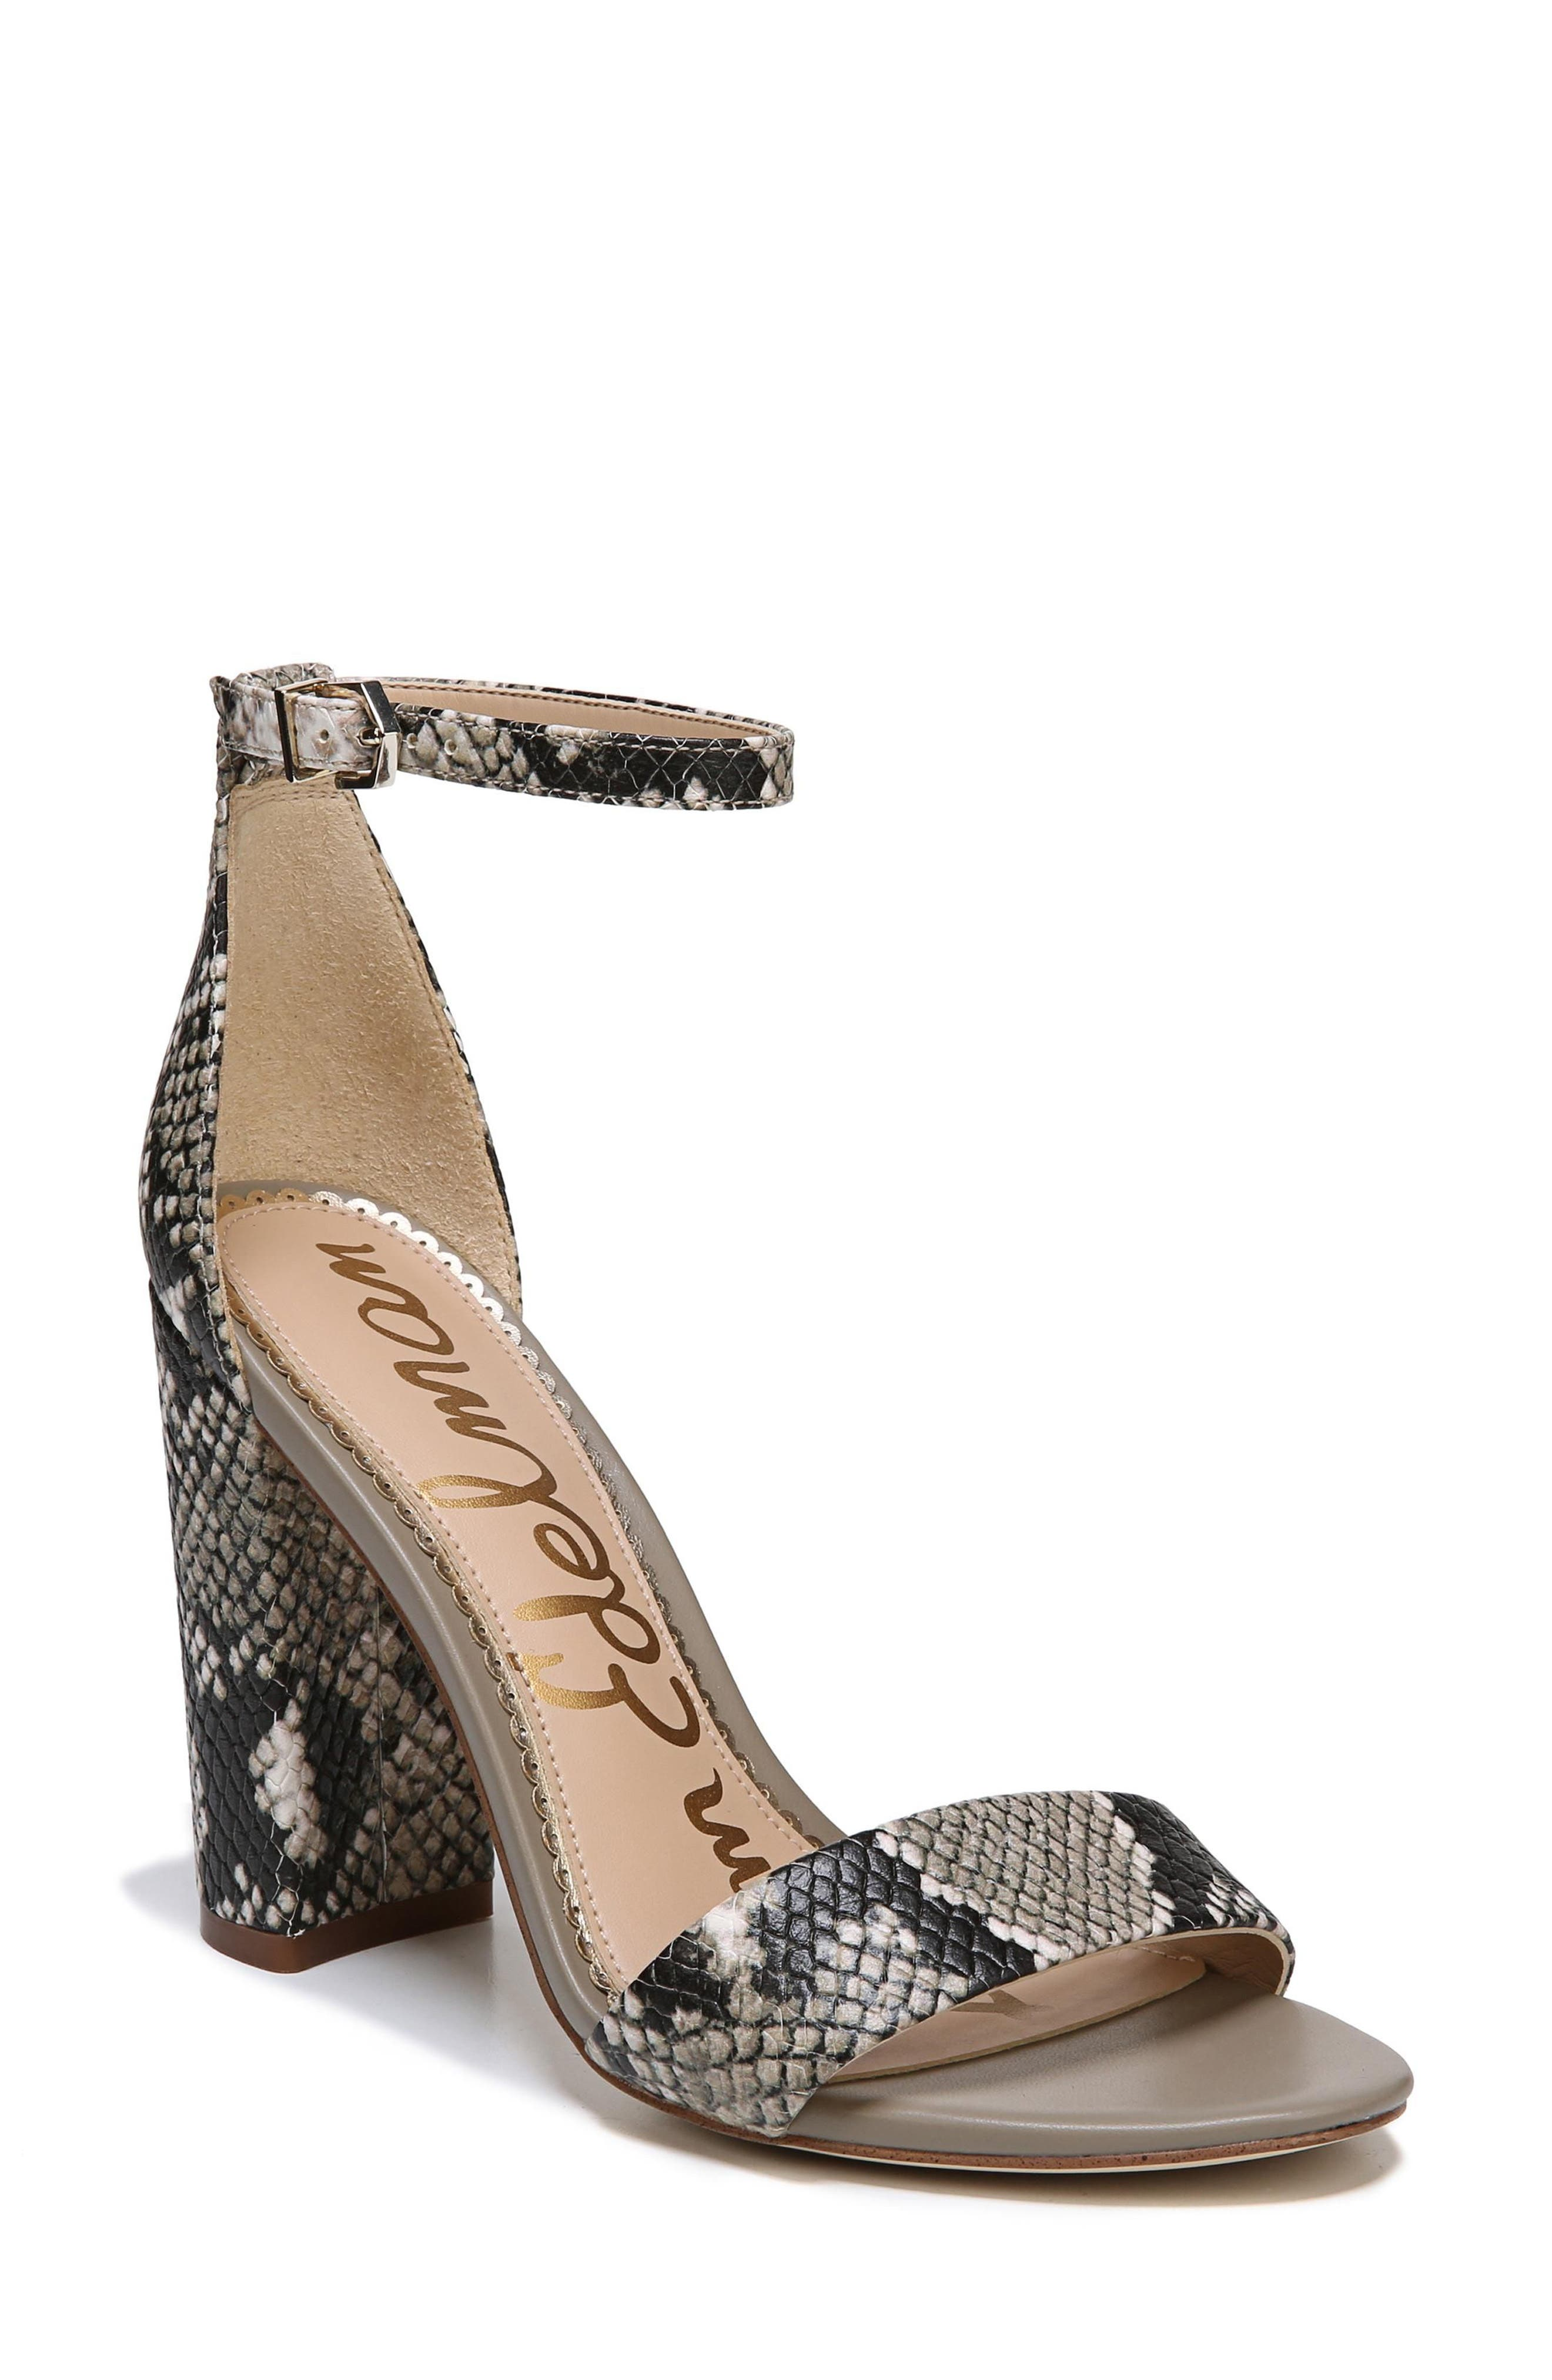 Yaro Ankle Strap Sandal,                             Main thumbnail 1, color,                             Natural Snake Print Leather